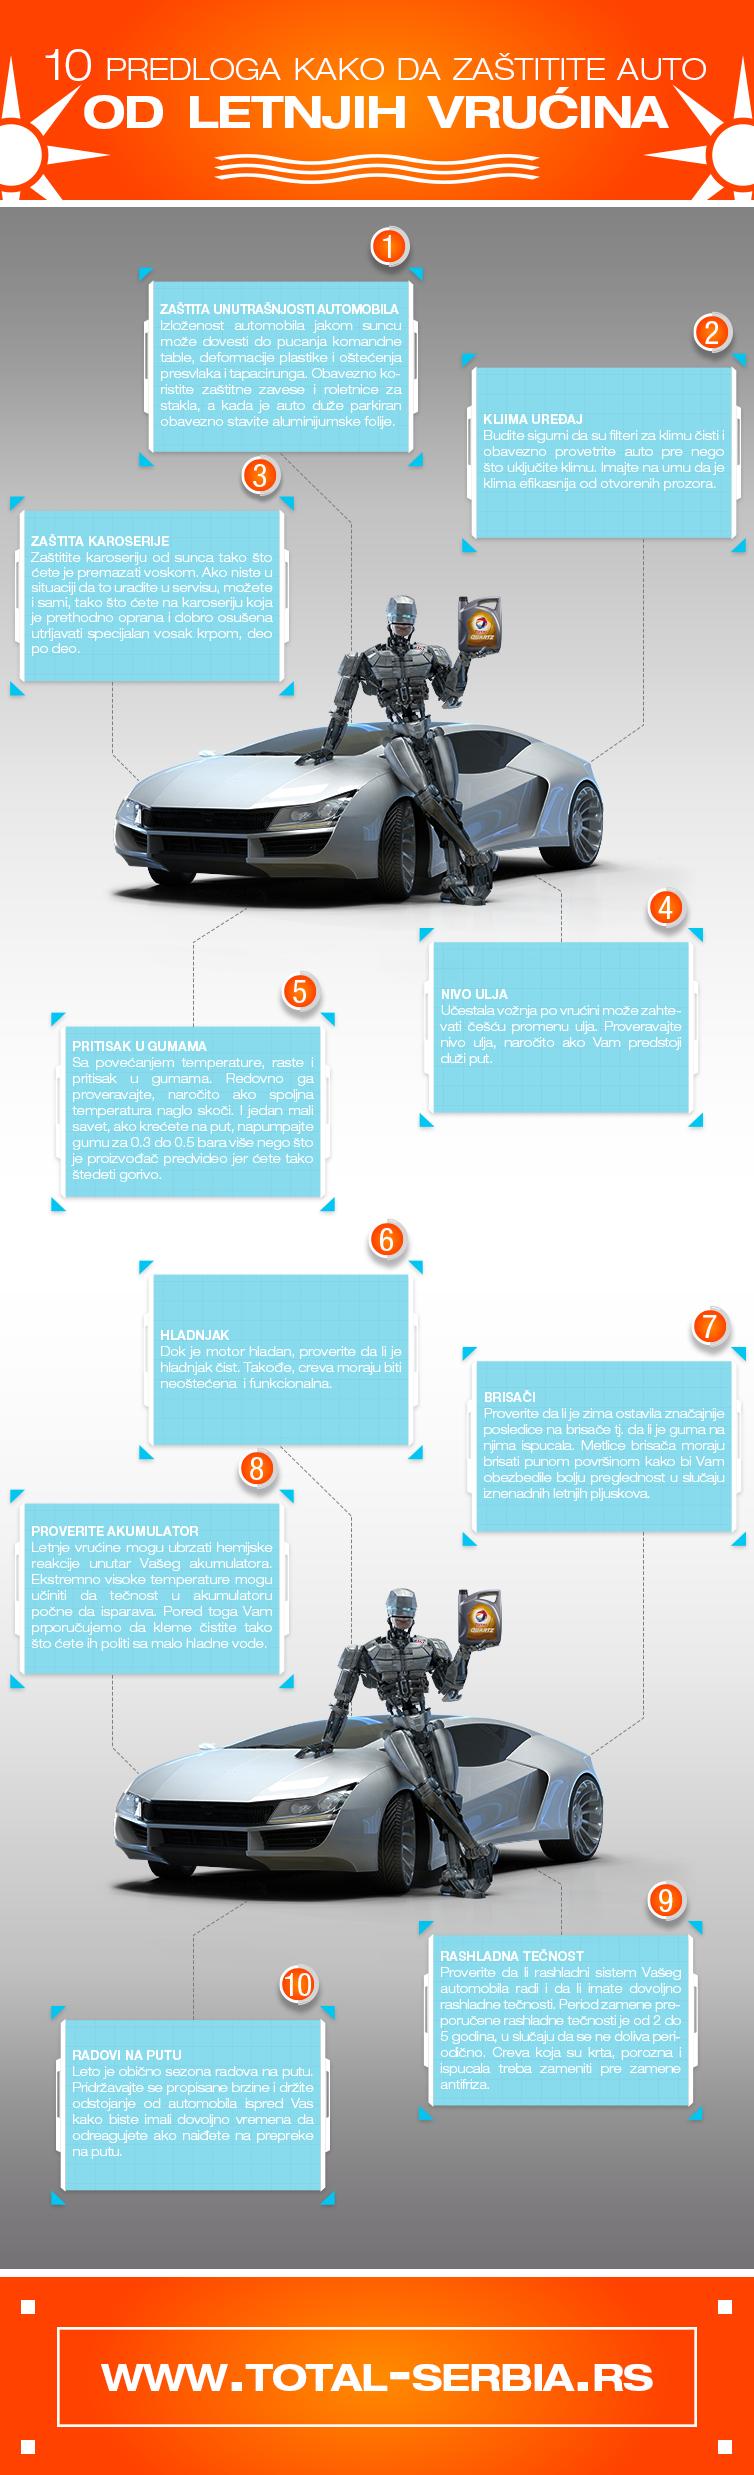 10 Predloga kako da zaštite auto od letnjih vrućina